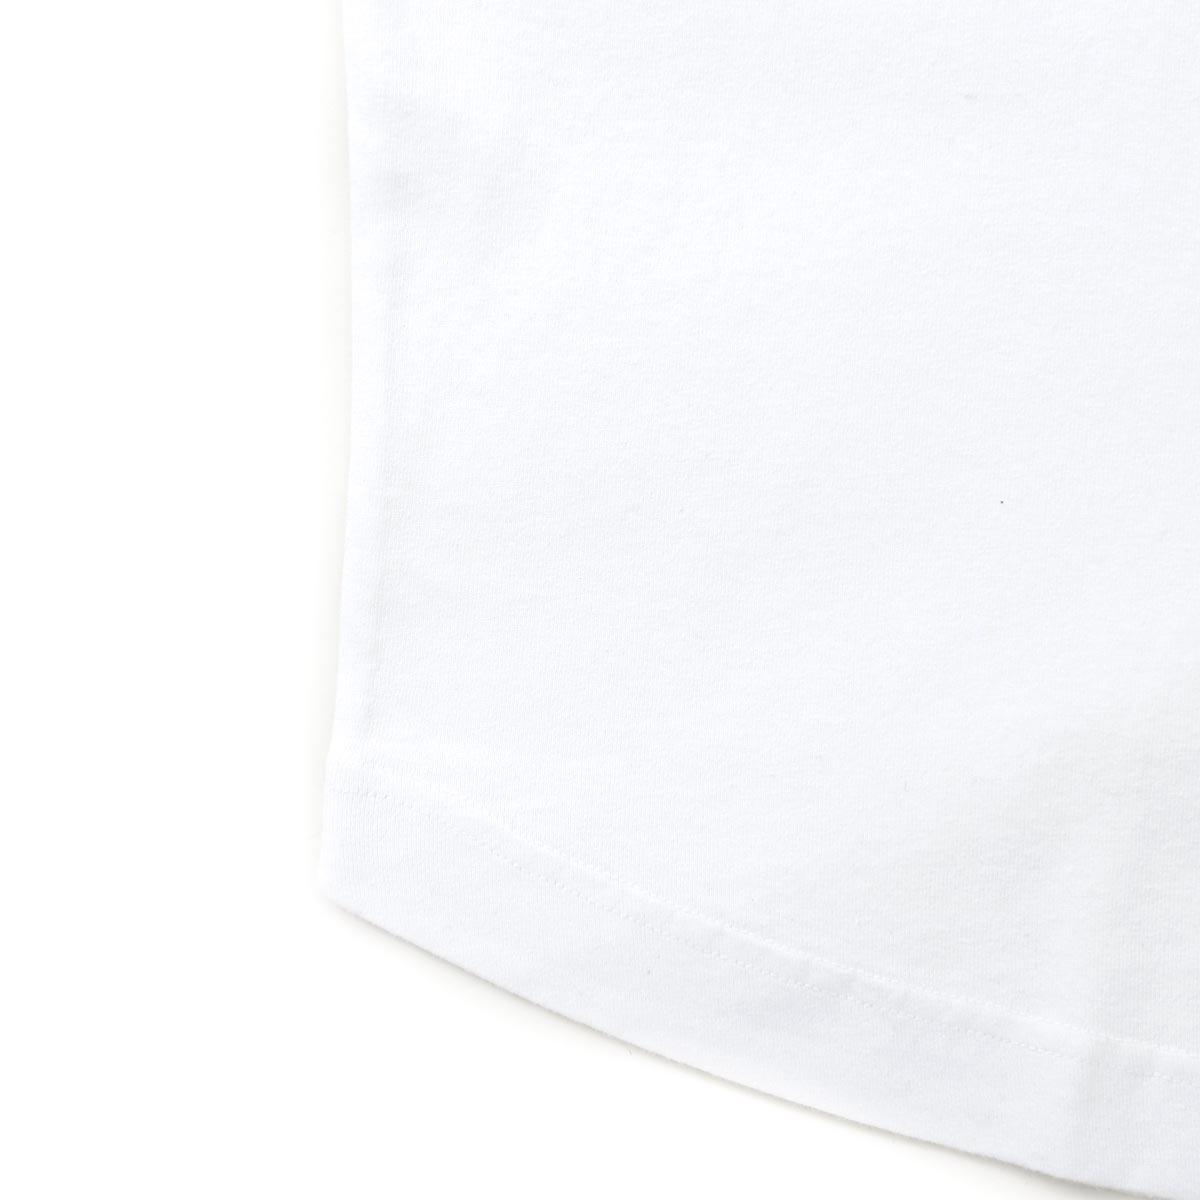 PALM ANGELS パーム エンジェルス Tシャツ/CLASSIC LOGO OVER TEE メンズ